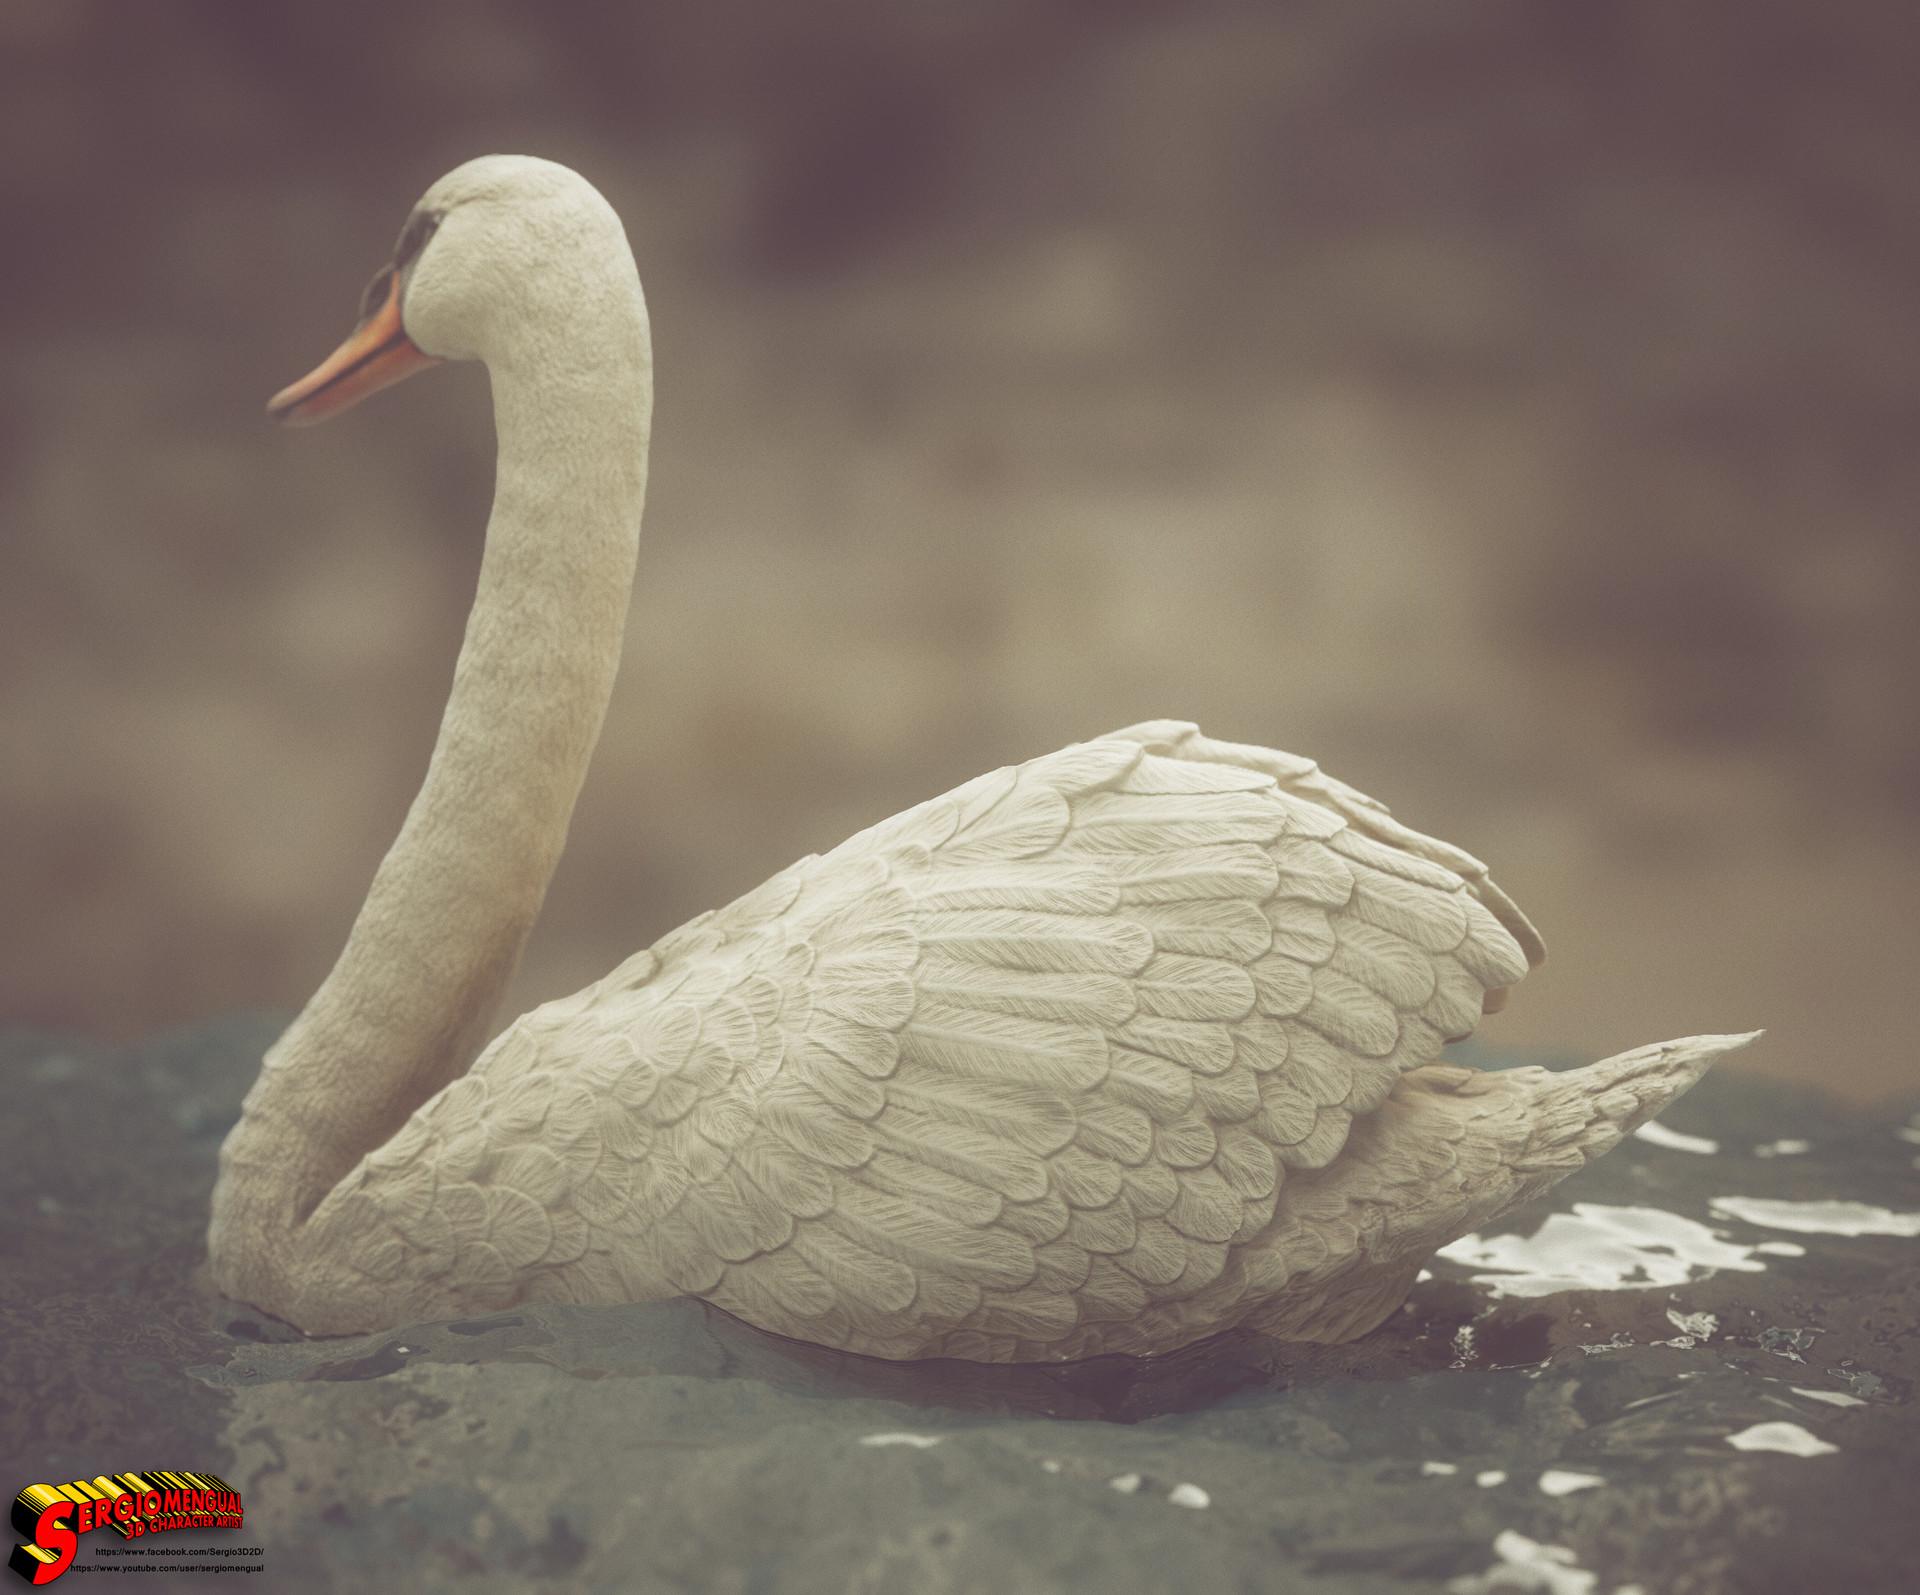 Sergio gabriel mengual swan square 9